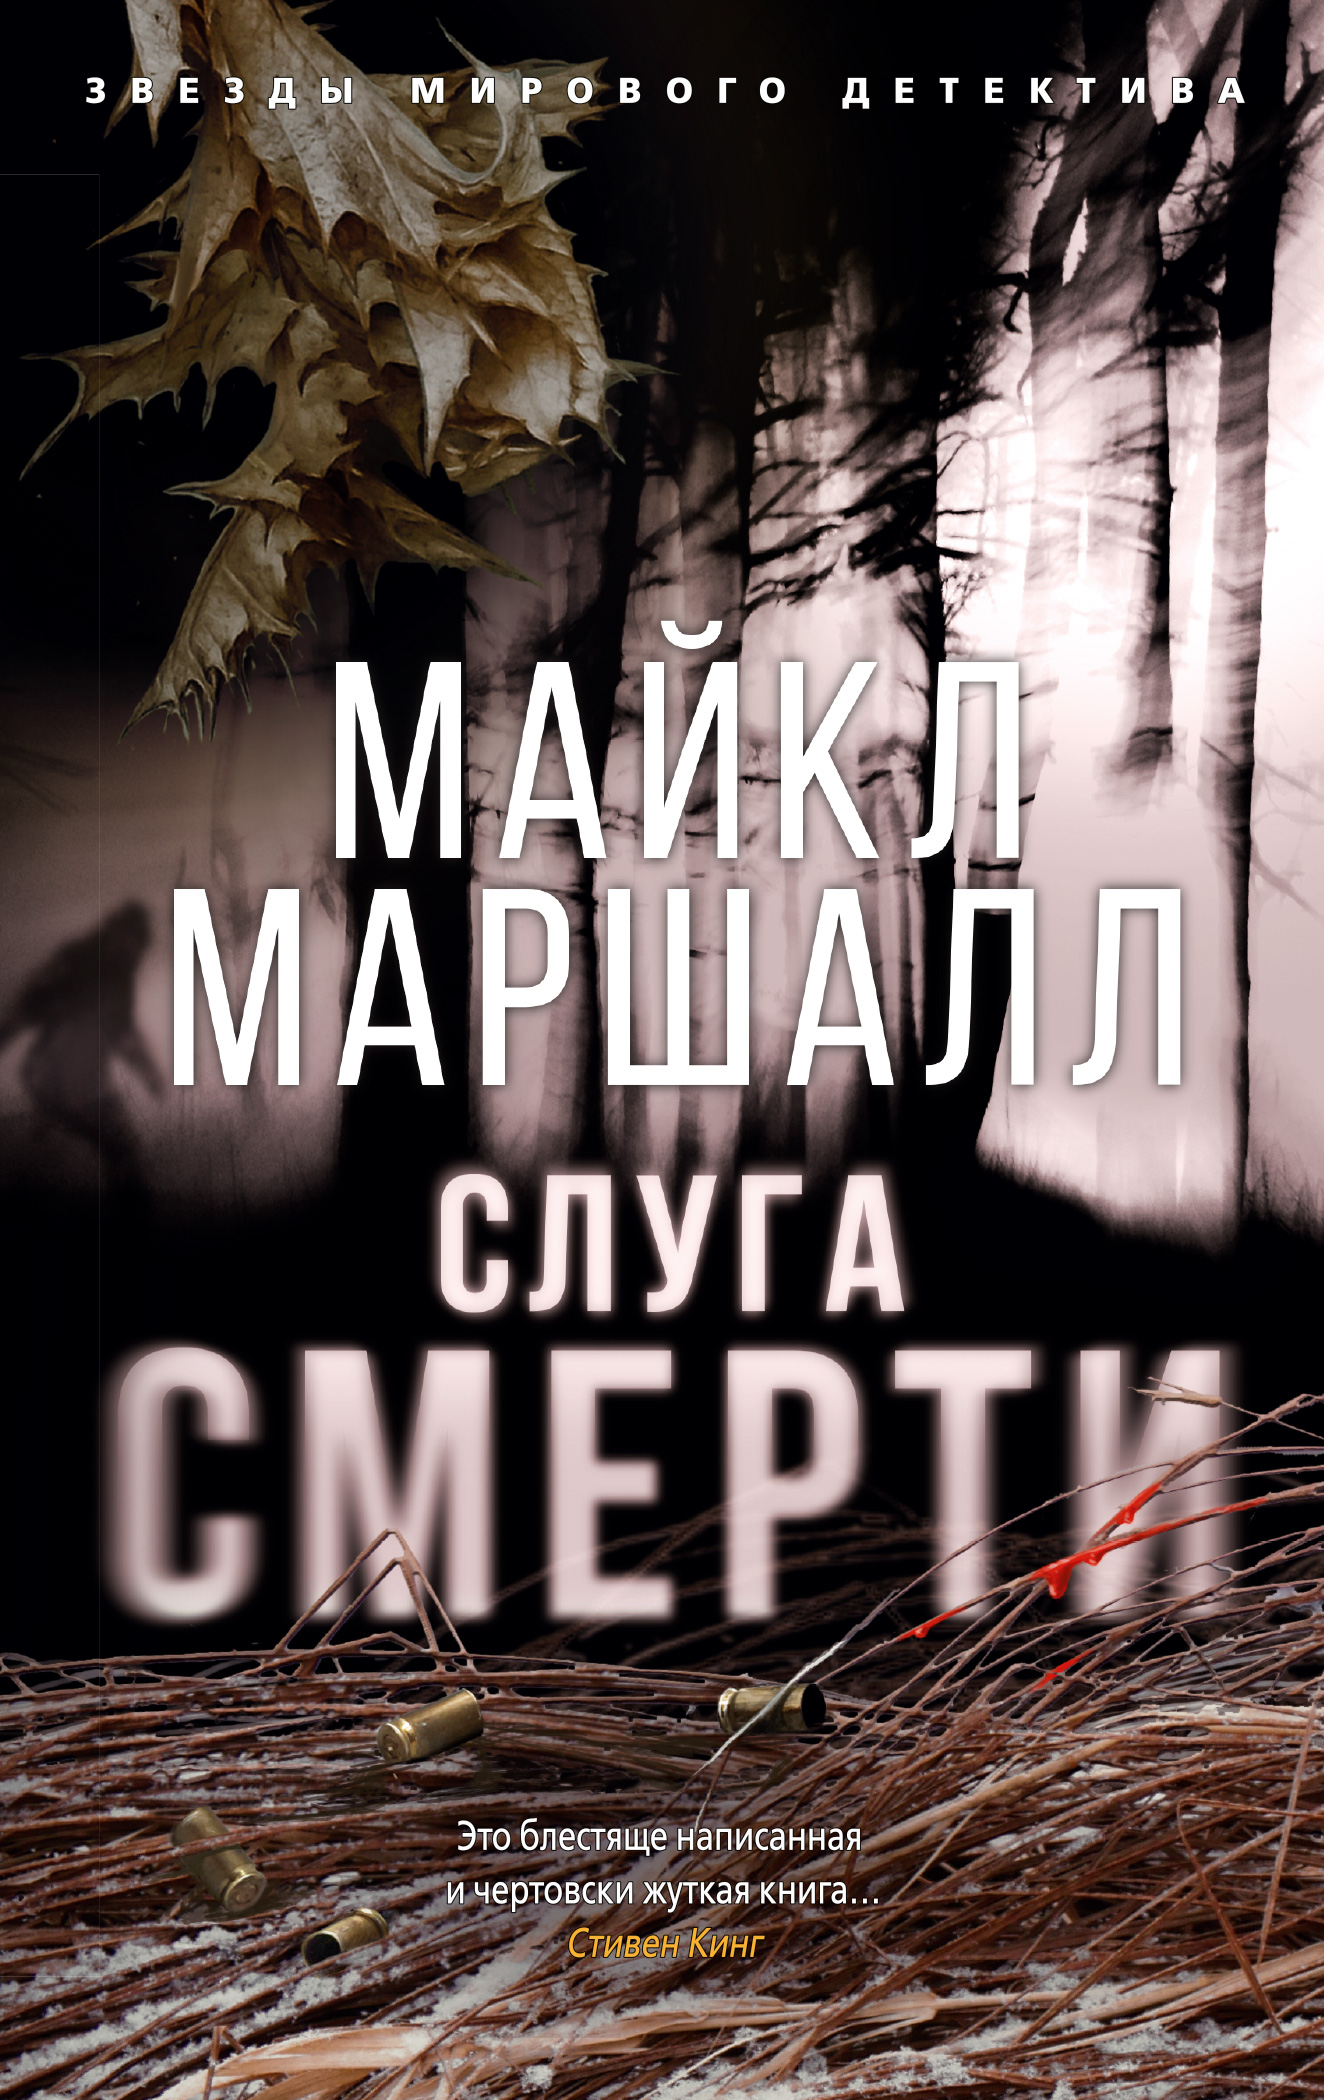 Майкл Маршалл — Слуга смерти (2004)